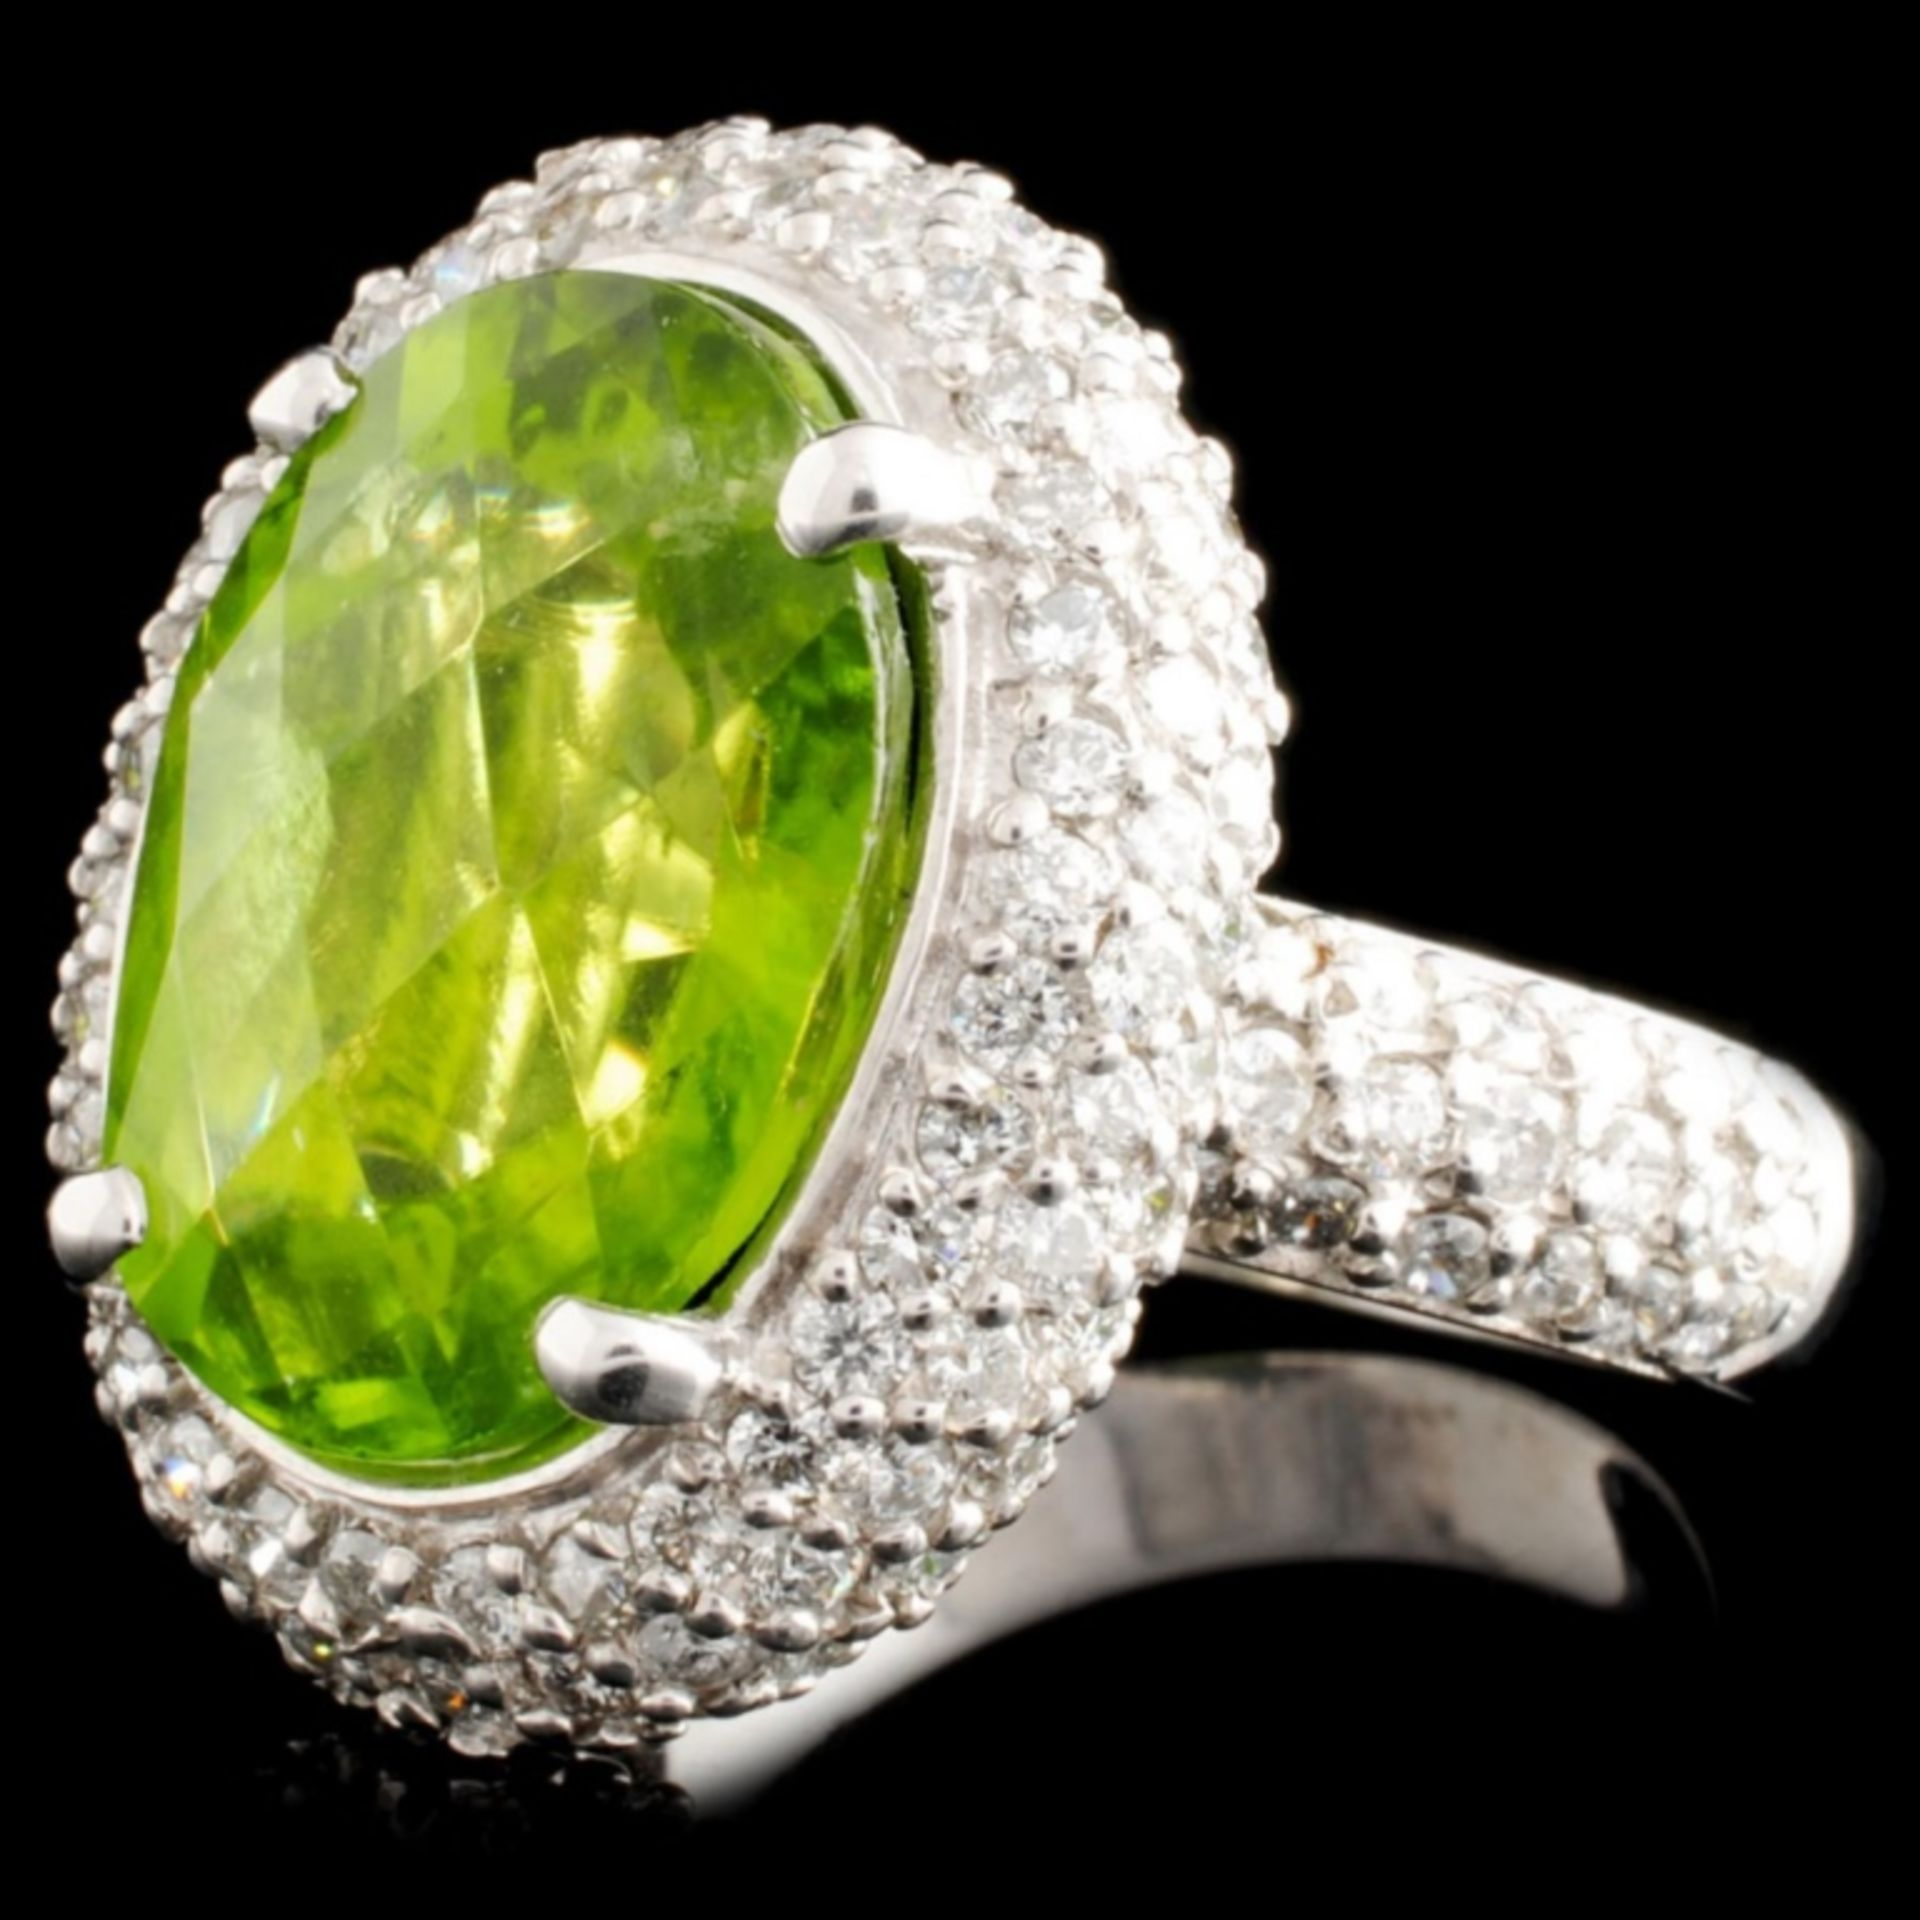 14K Gold 9.28ct Peridot & 2.40ctw Diamond Ring - Image 2 of 5